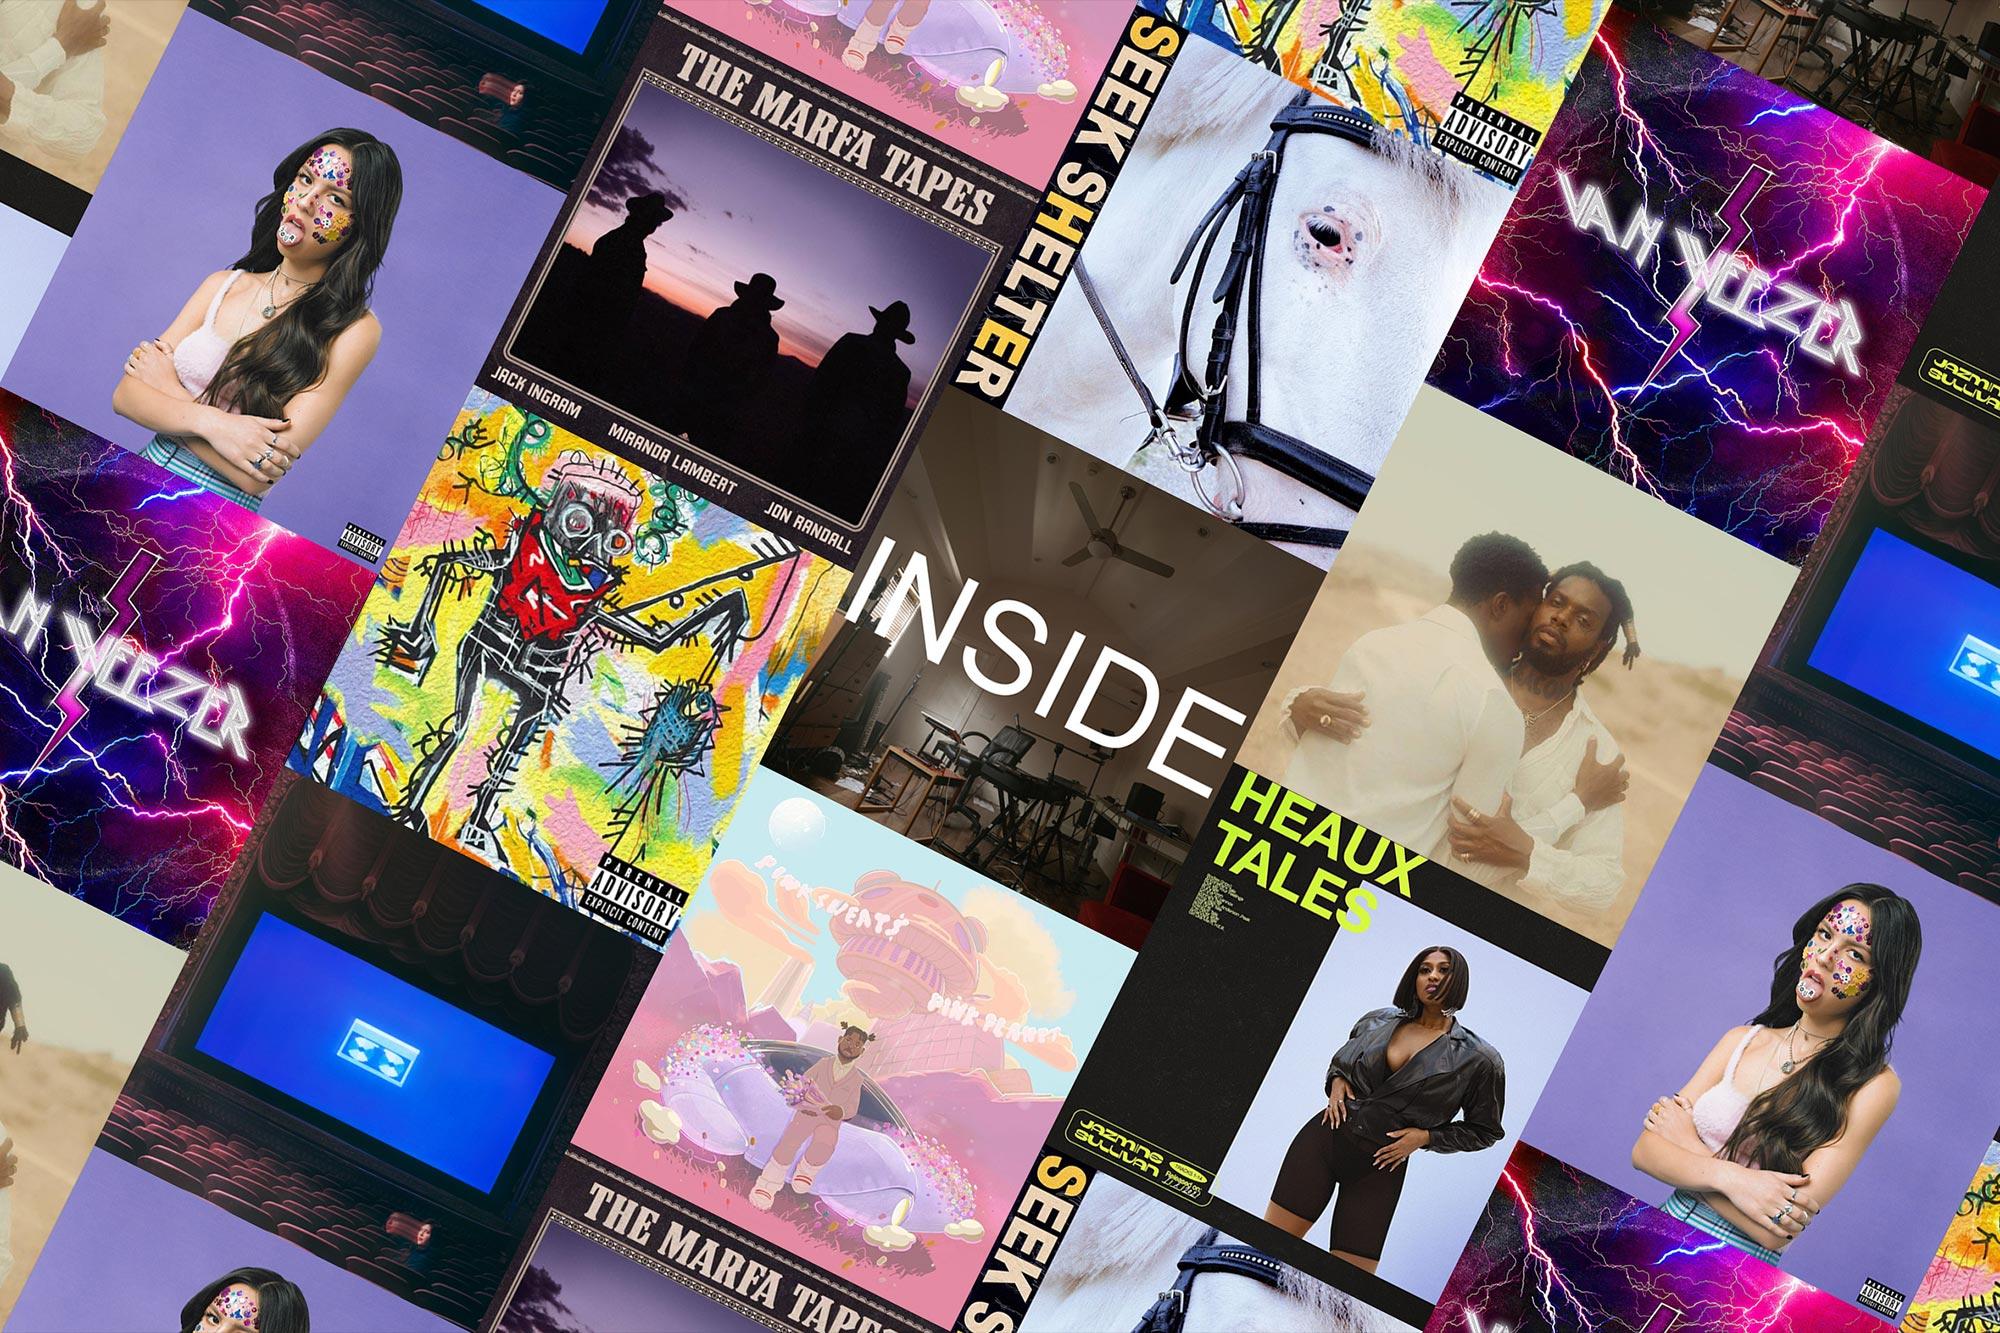 Best Albums of 2021 so far